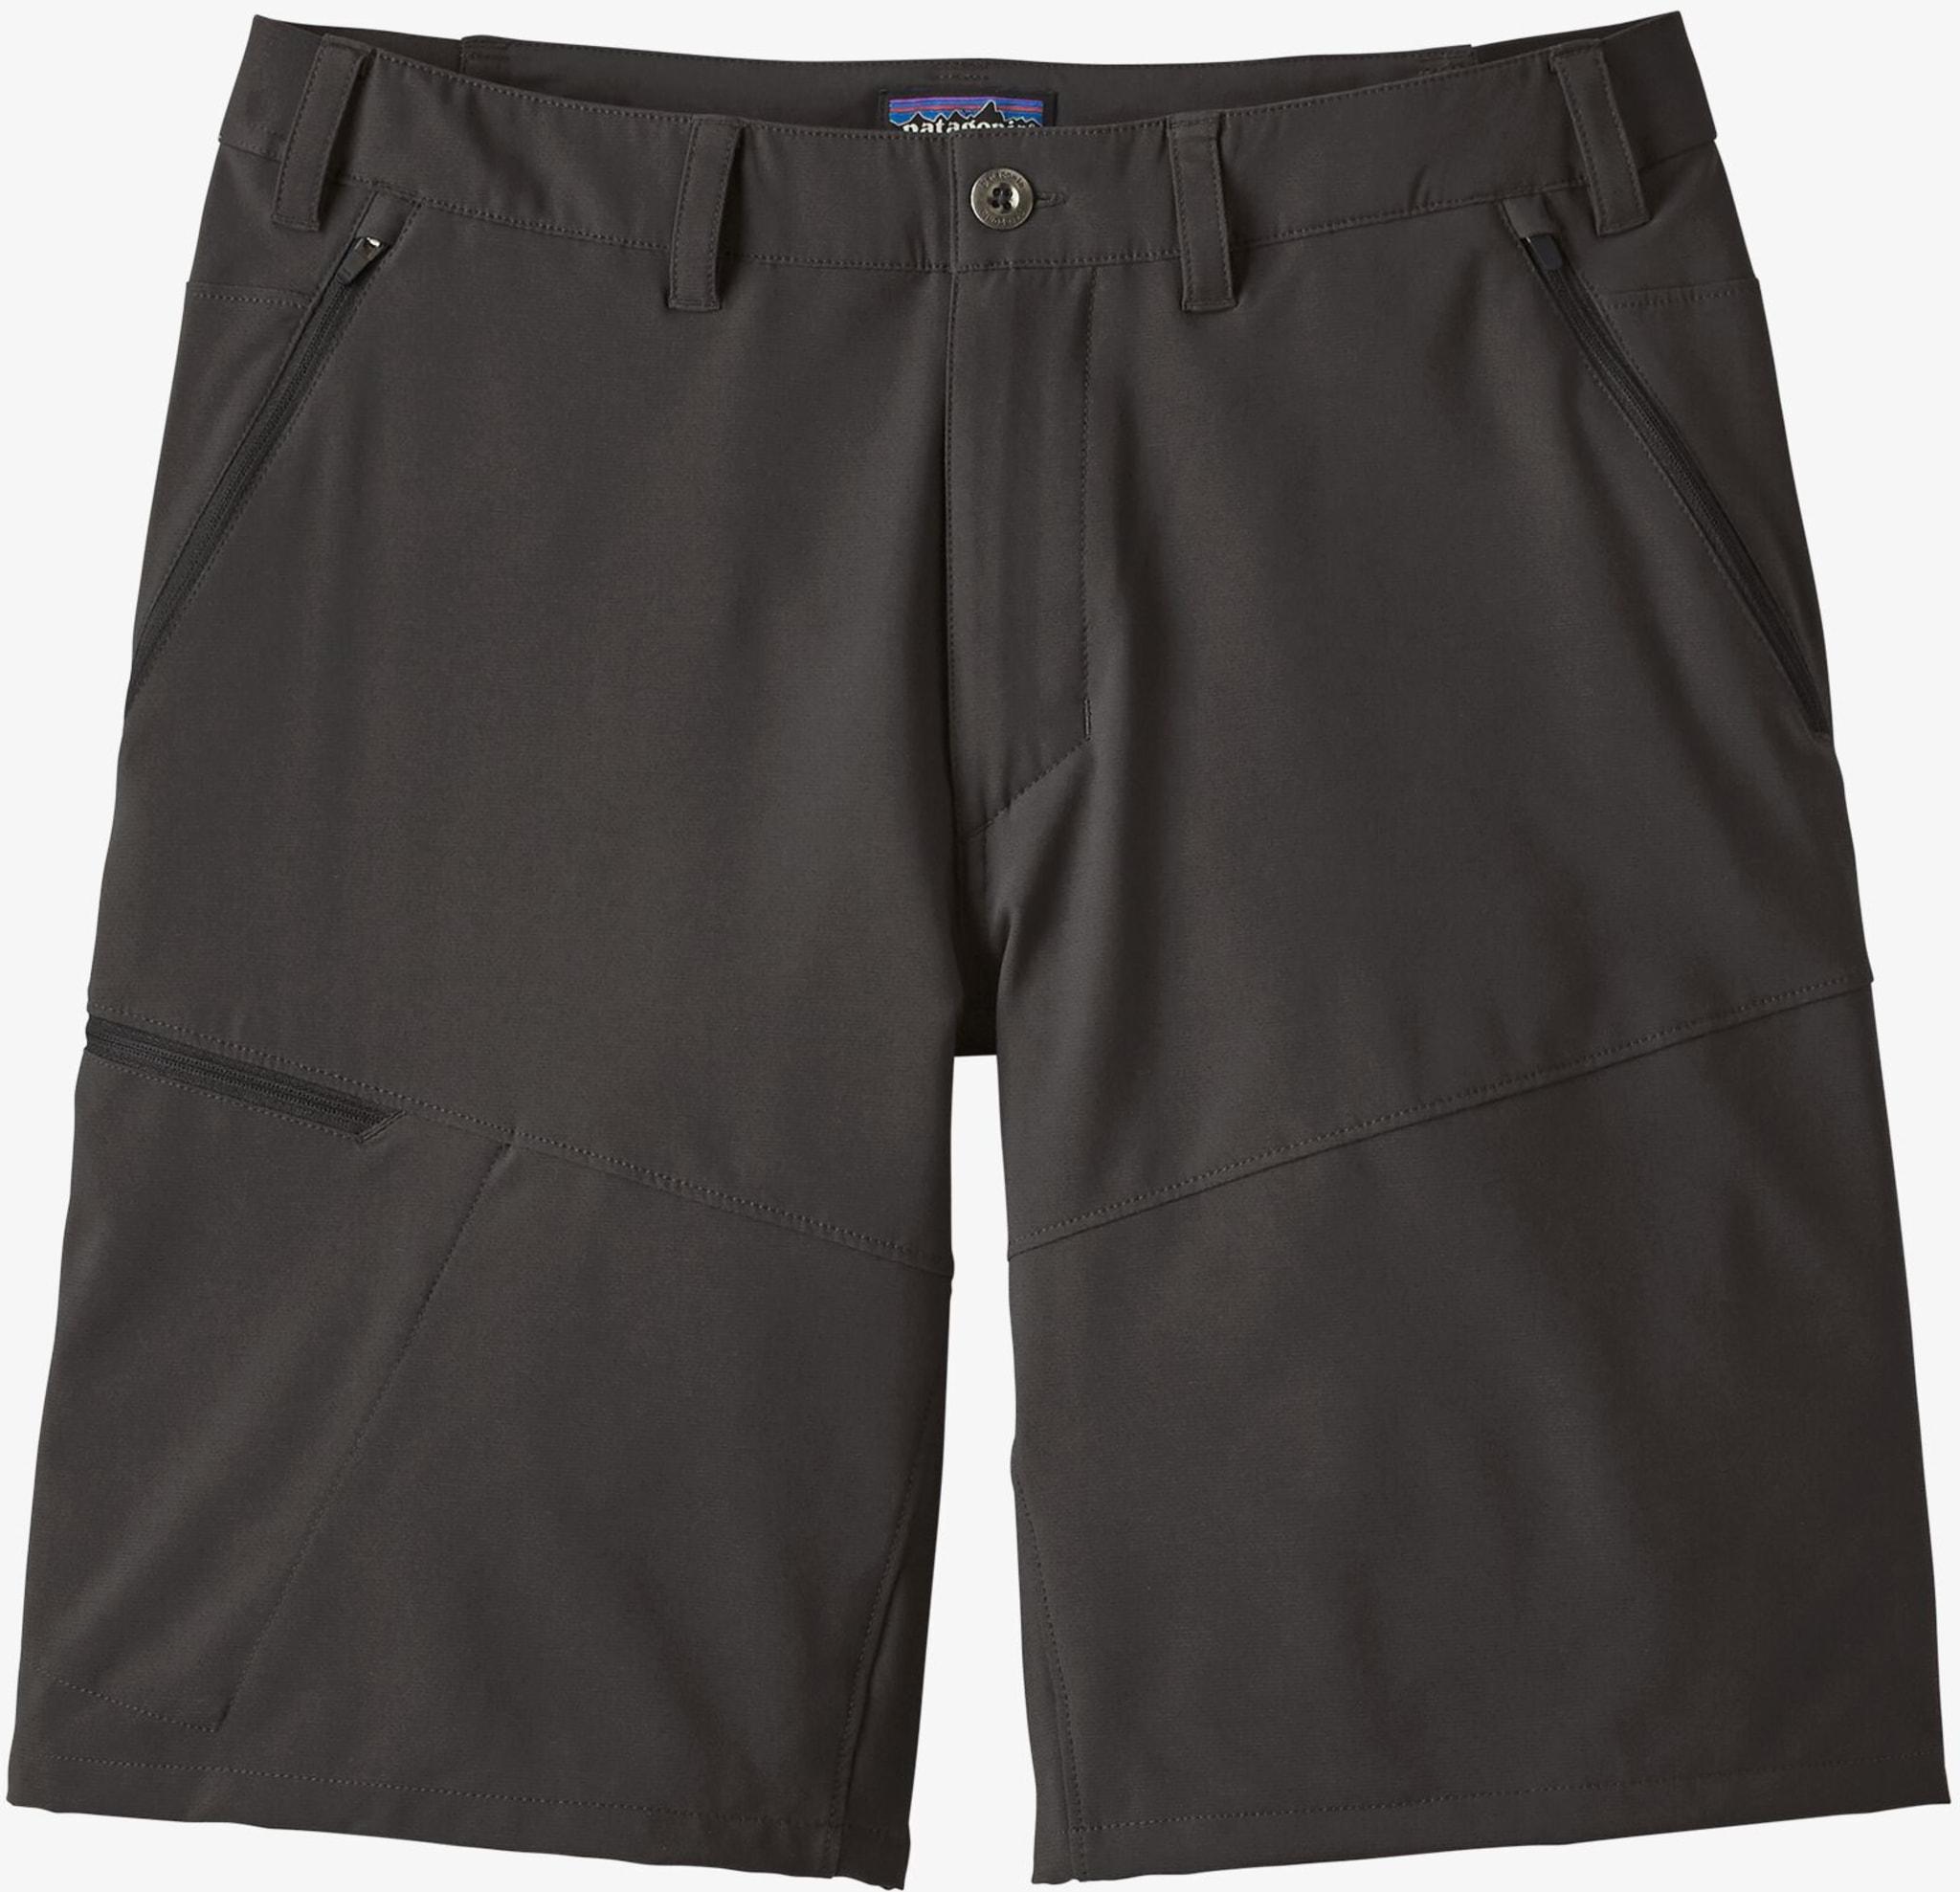 Vannavvisende og komfortabel shorts til all aktivitet